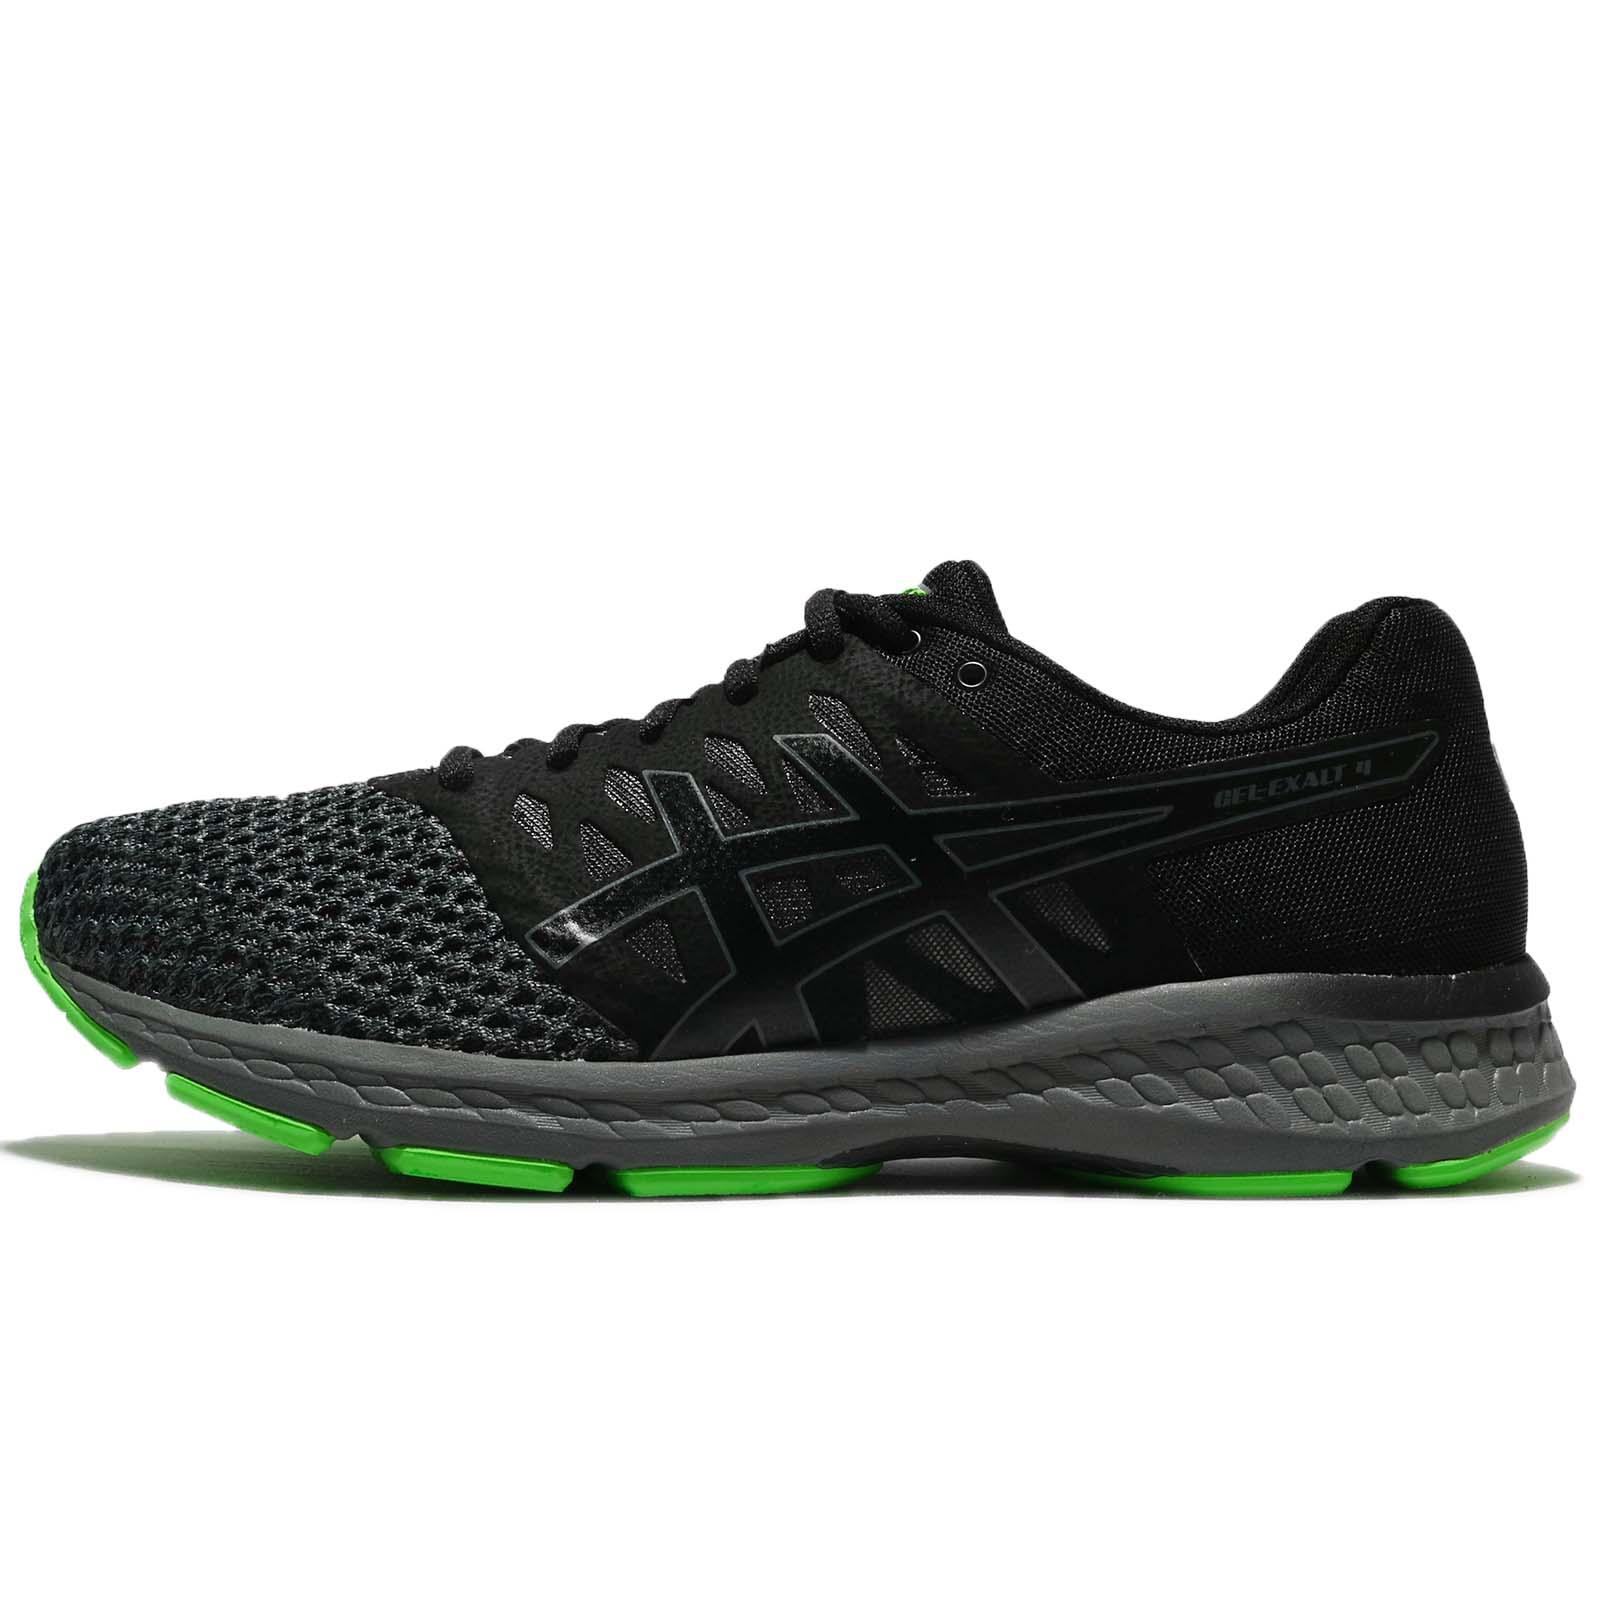 Asics Gel-Exalt 4 IV Black Carbon Green Men Running Shoes Trainers T7E0N- 9097 3b10e964e6